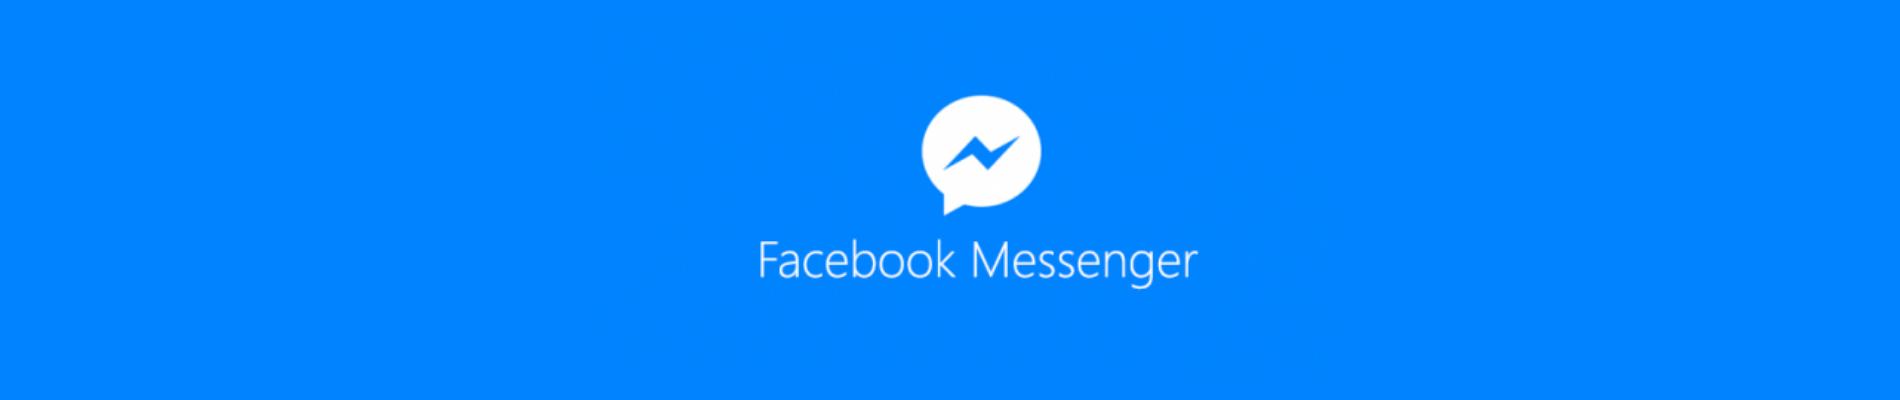 facebook marketing messenger case study